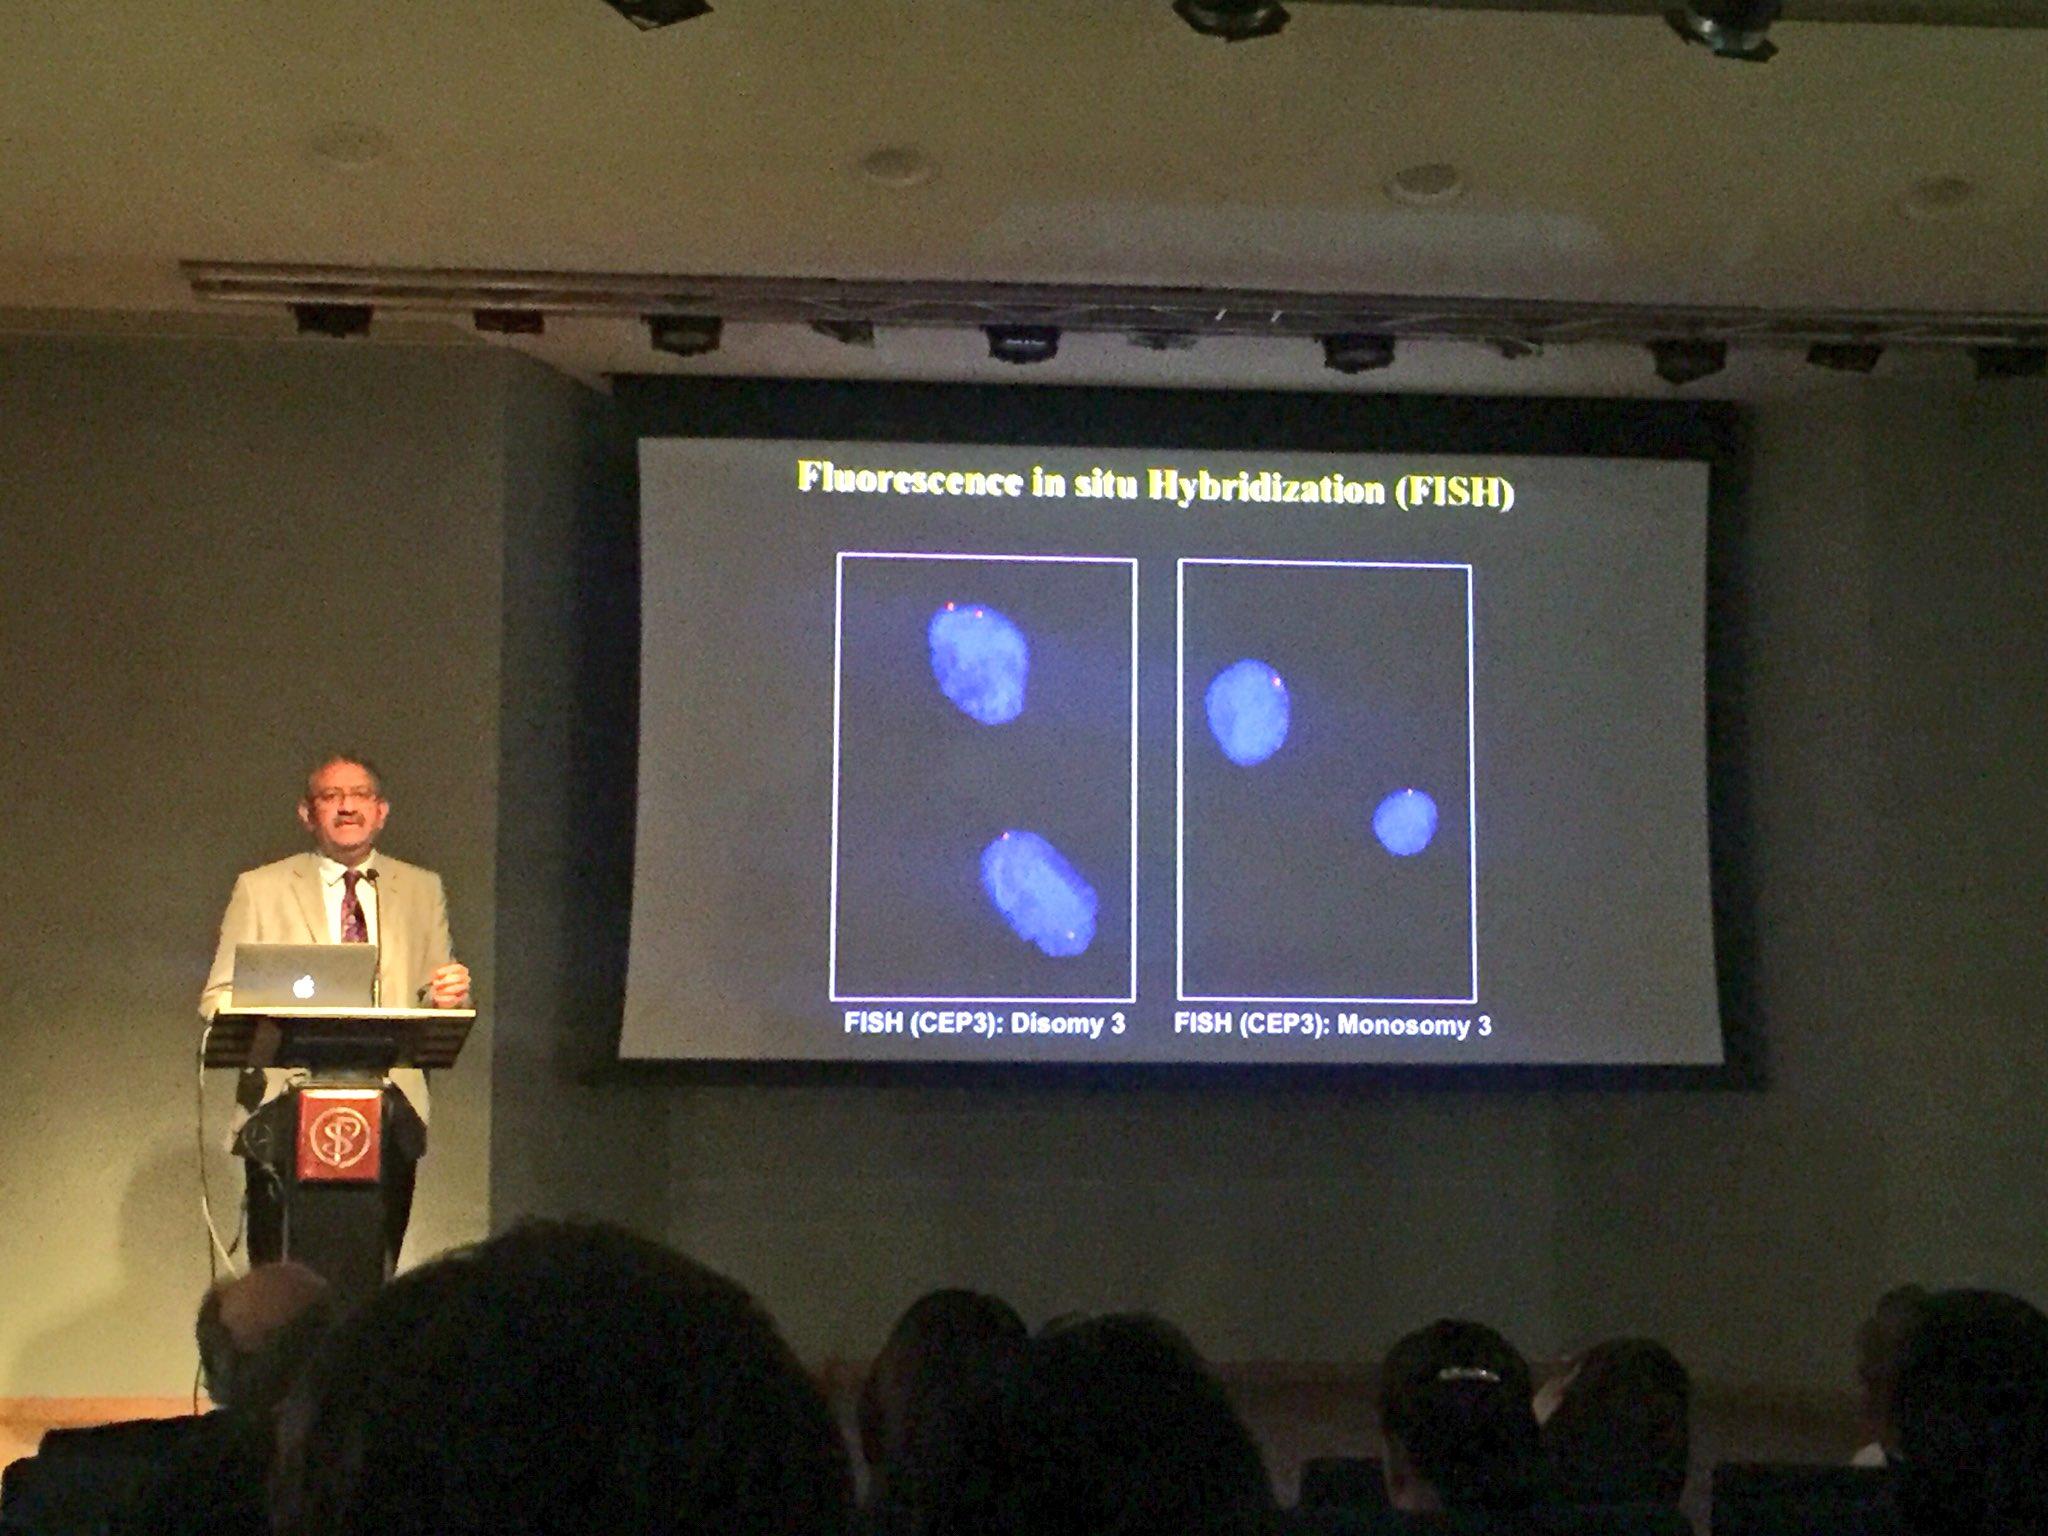 👁Teaching points with Dr Singh: Uveal Melanoma, important realize #FISH looking presence of Monosomy 3 is a risk factor of metastasis 🔬 #ophtalmology #pathology #oncology #melanoma #metastasis https://t.co/DJui37Dih9